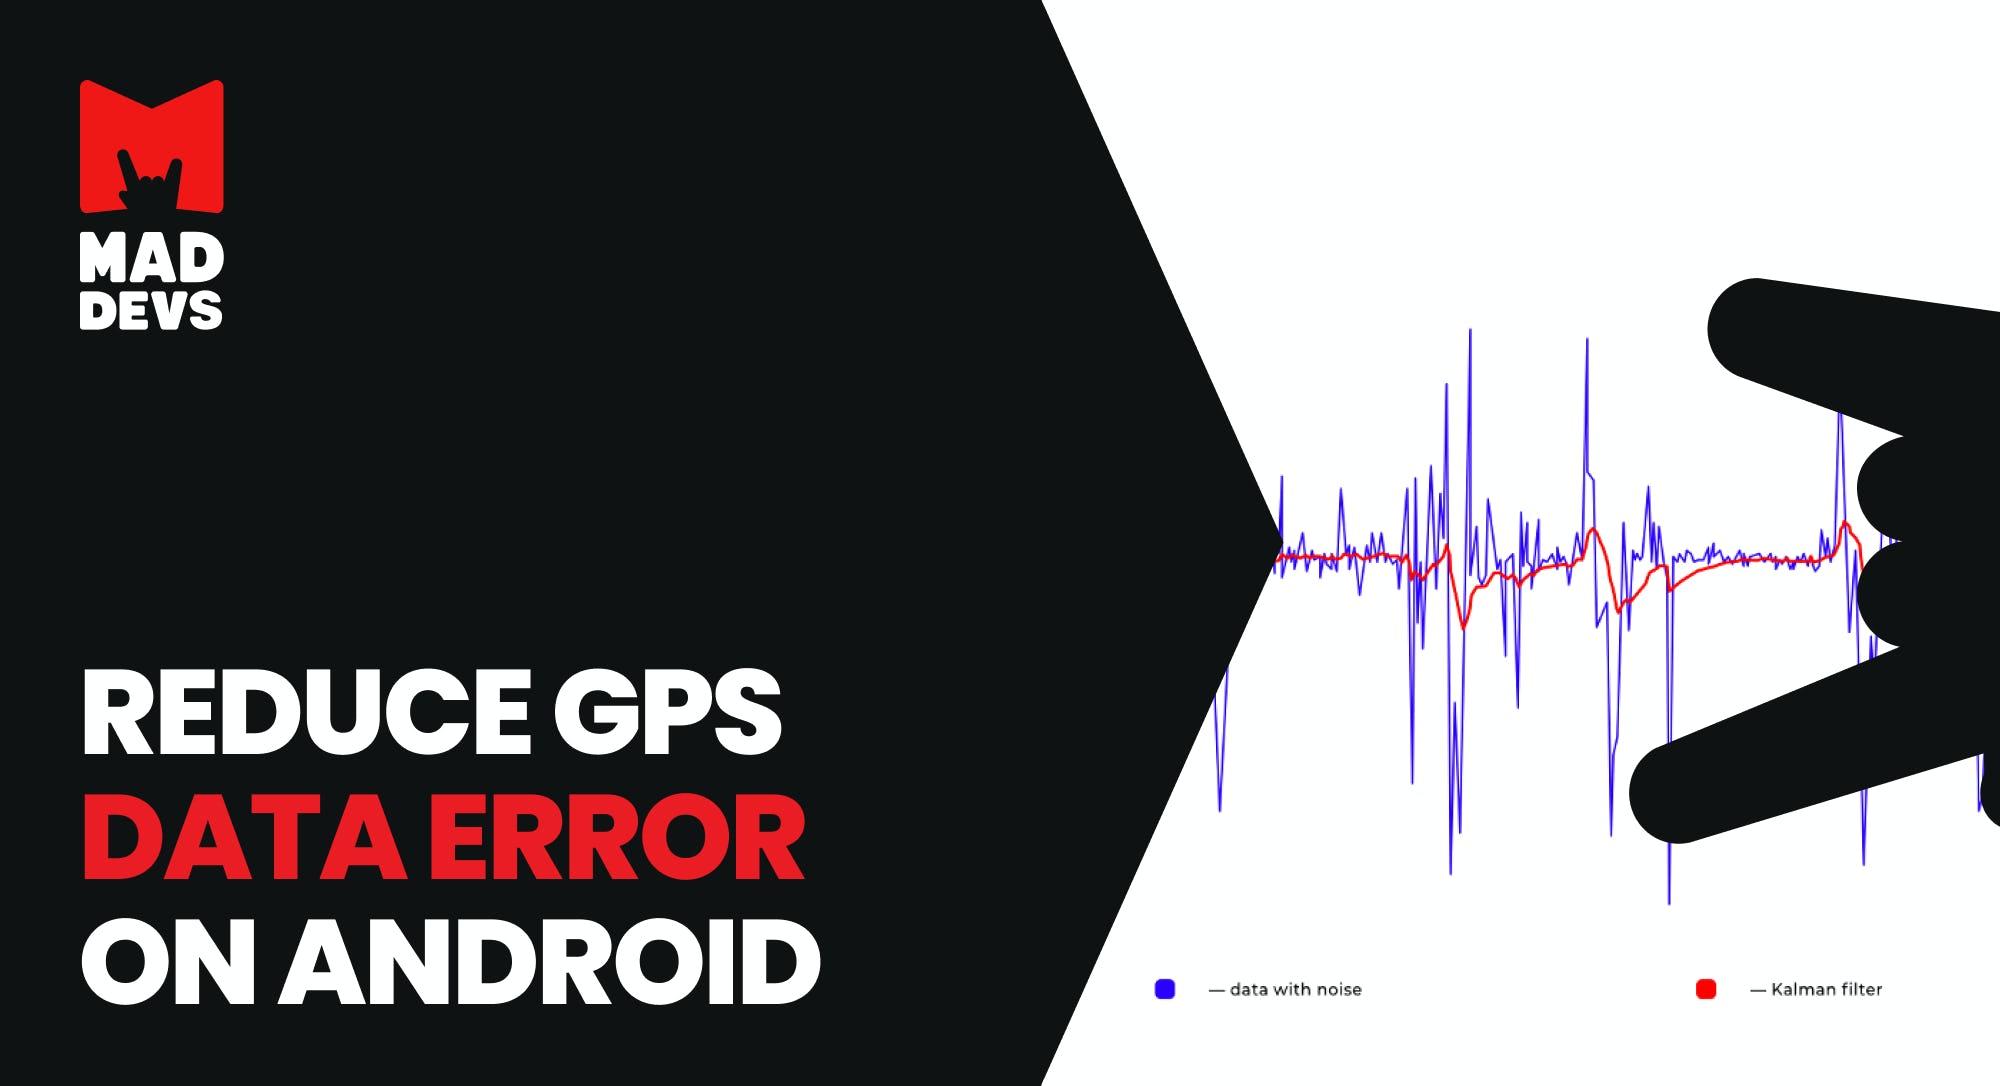 Reduce GPS